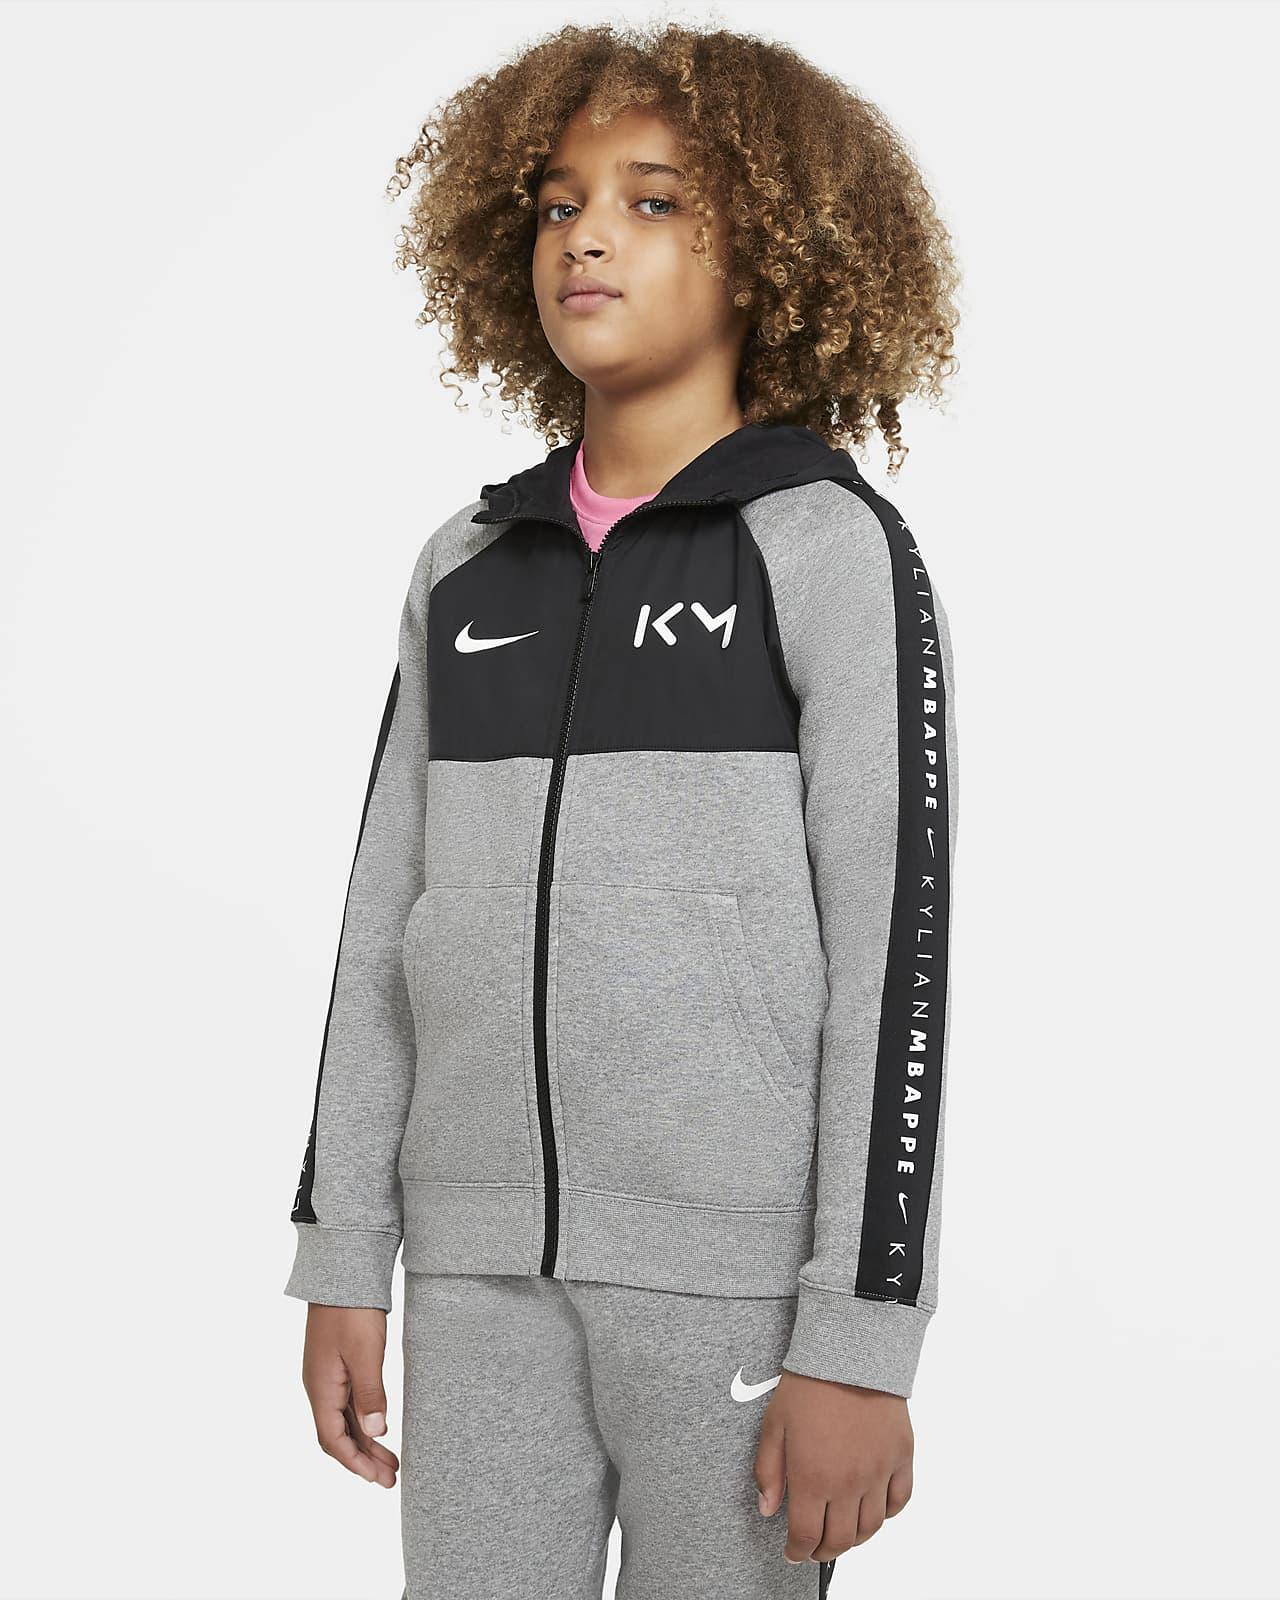 Kylian Mbappé Big Kids' Full-Zip Fleece Soccer Hoodie